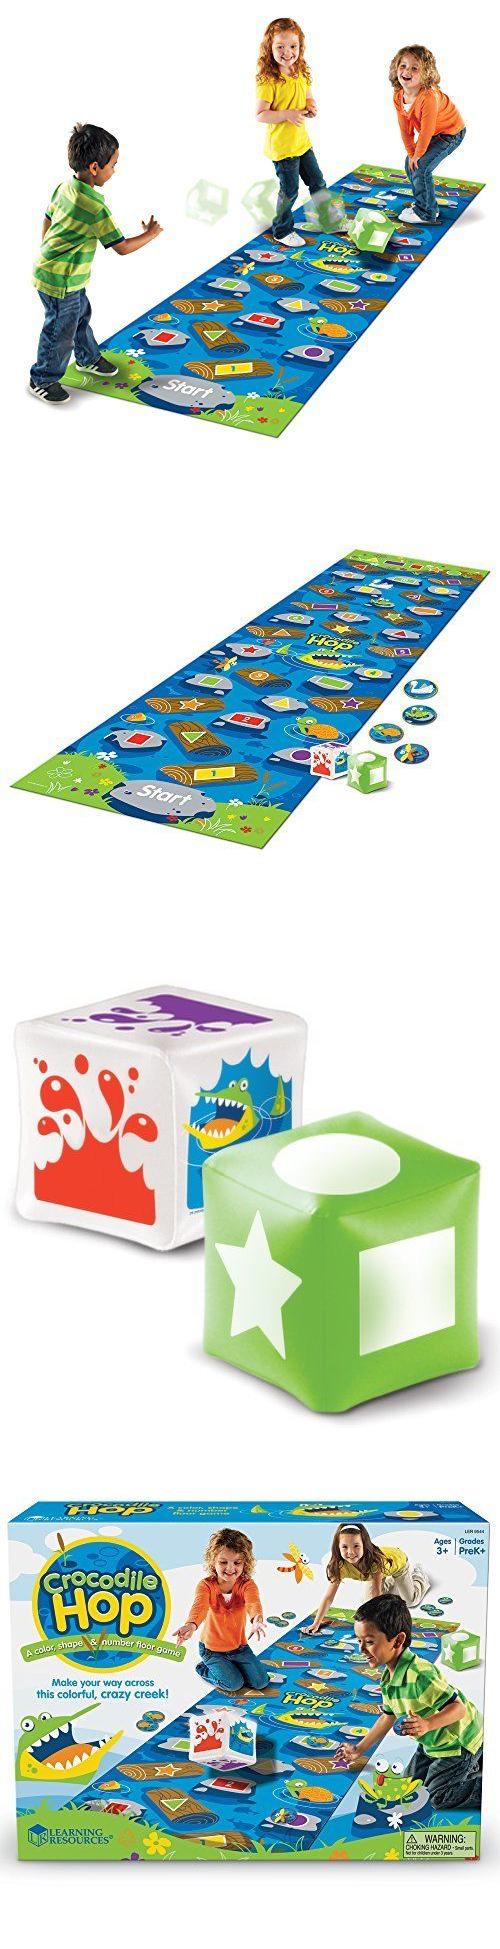 500x1949 Blocks Tiles And Mats 145931 Toddler Floor Game Mat Kid Crocodile